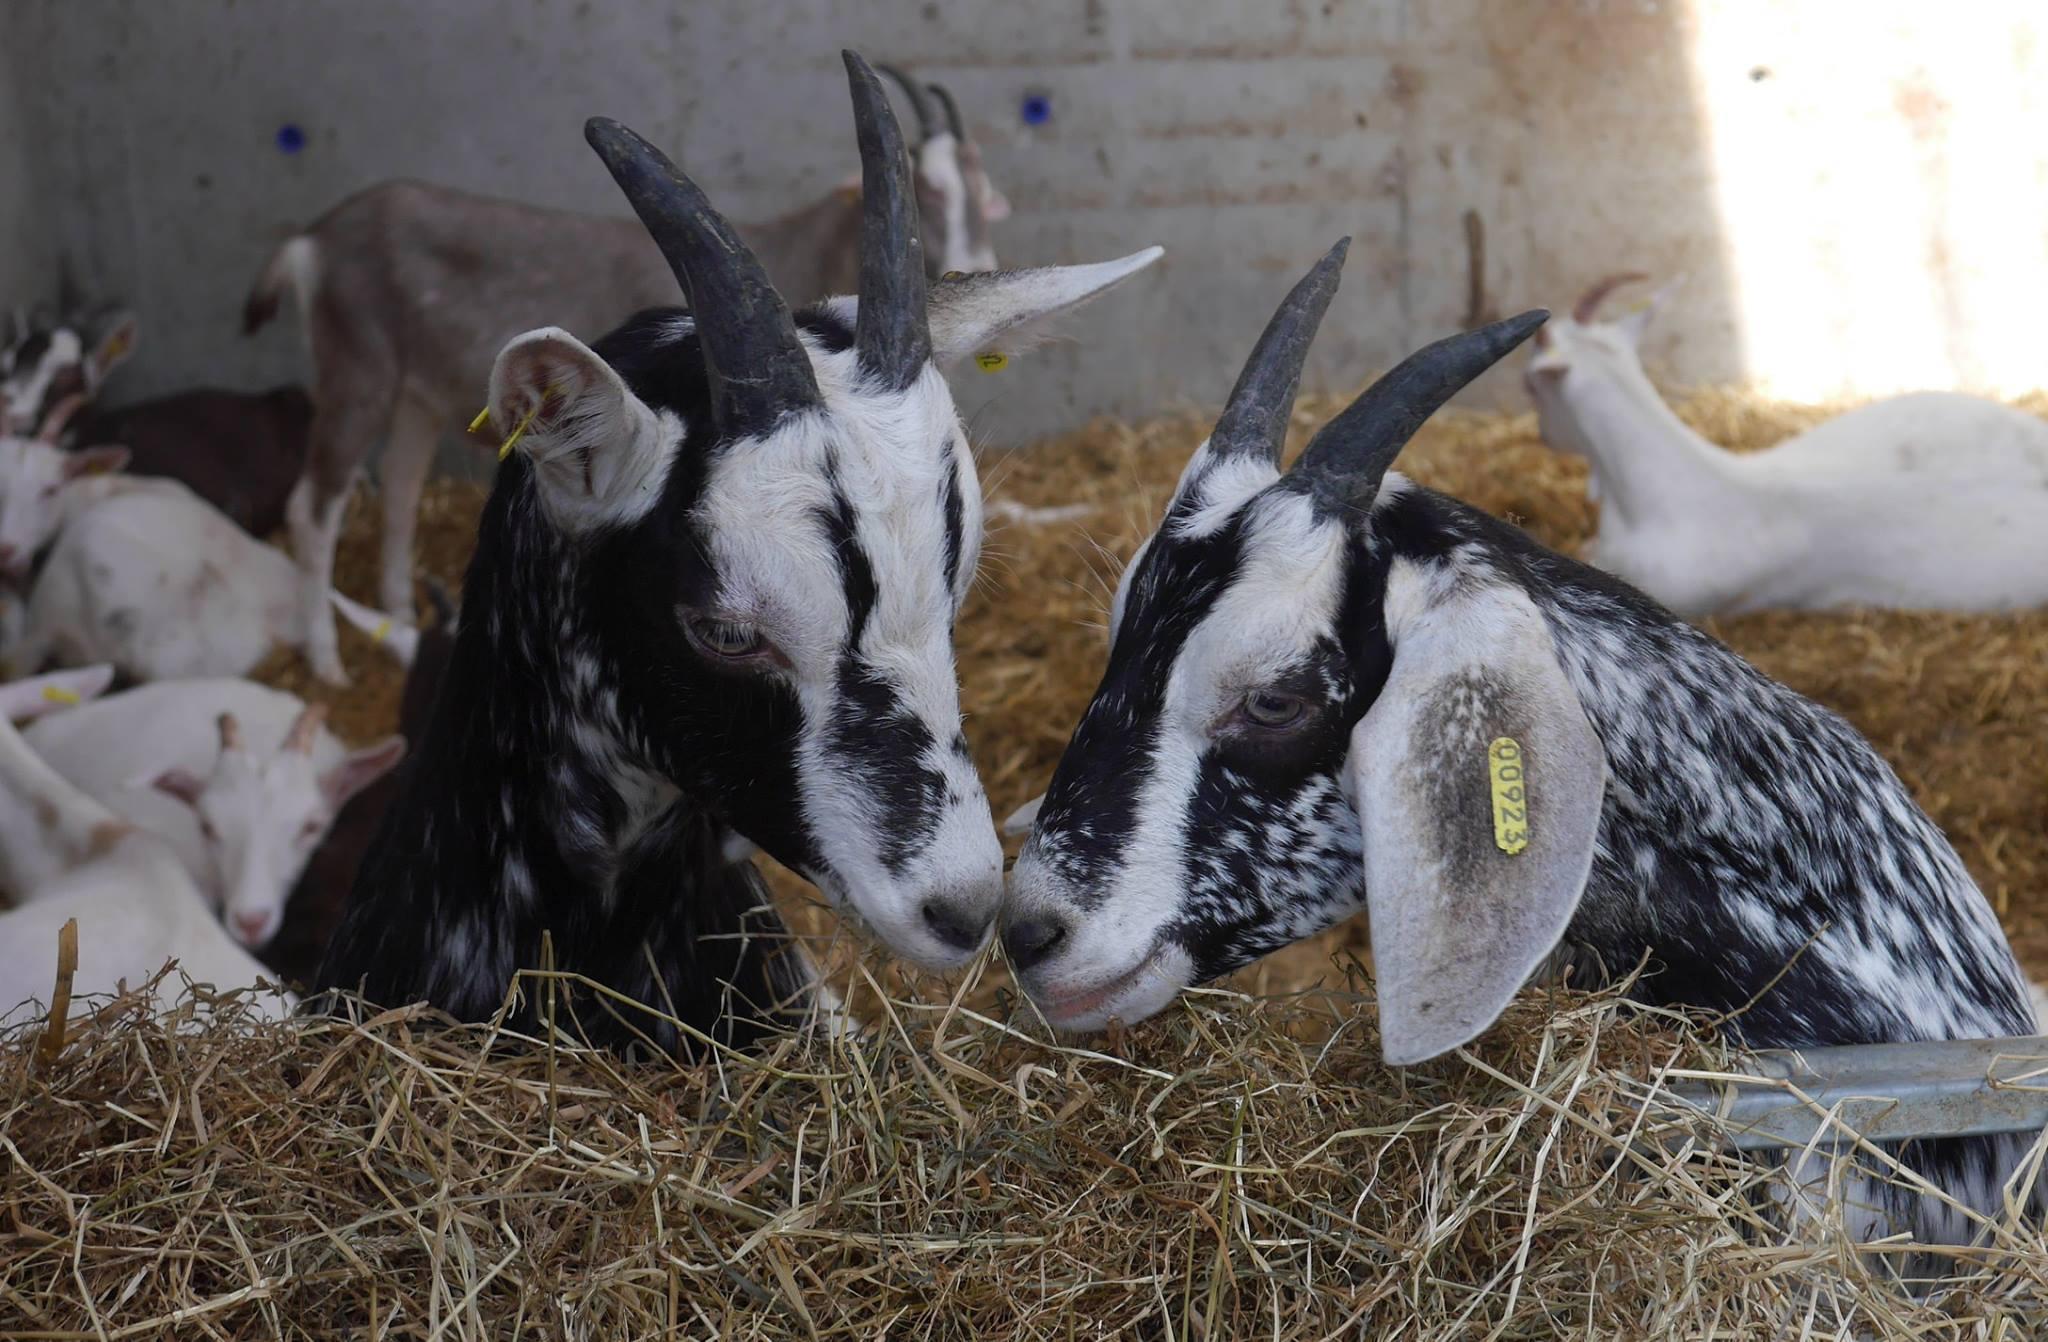 Donal Skehan visits Broughgammon Farm